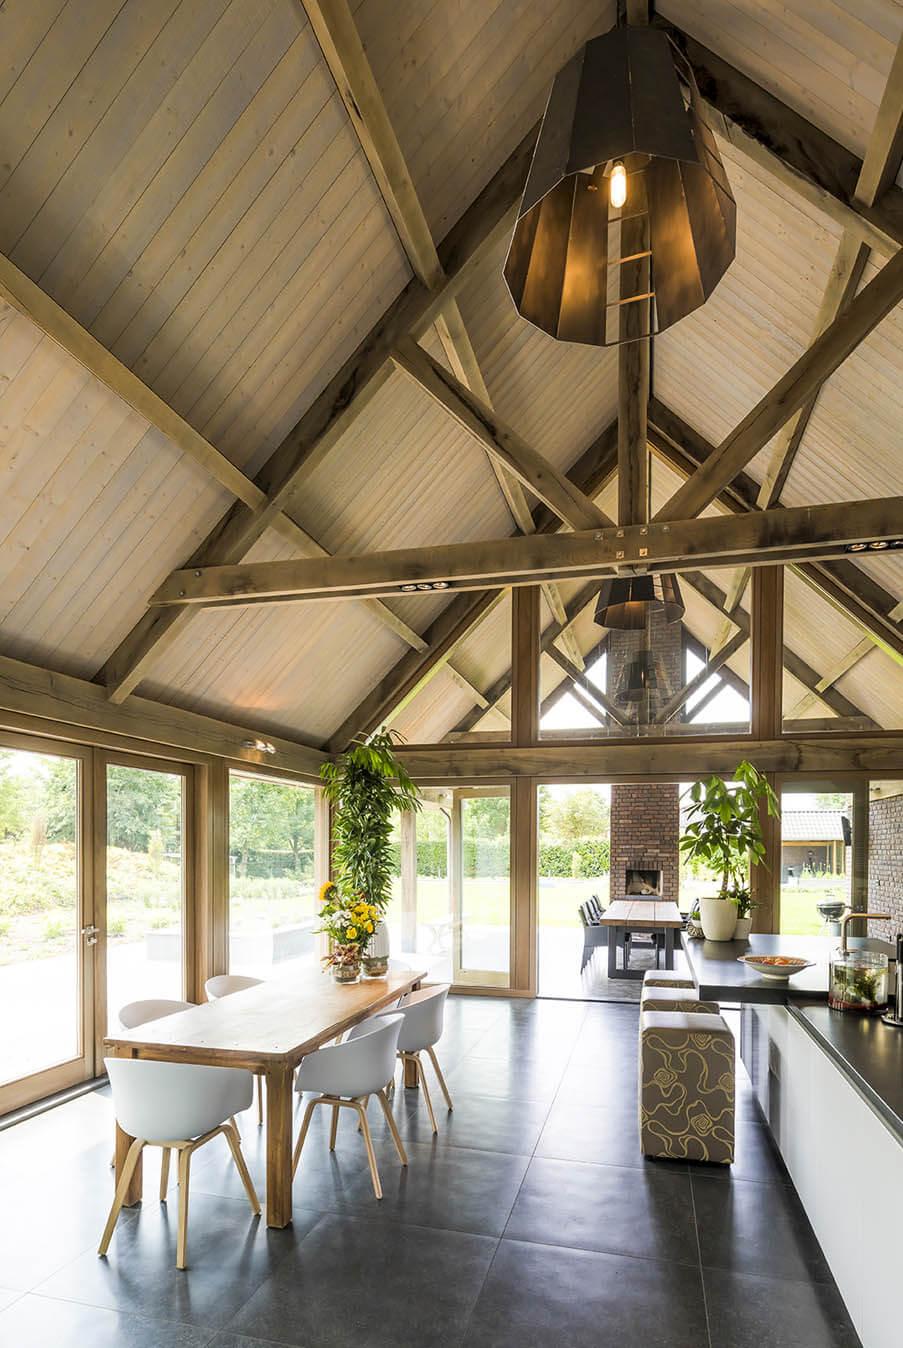 Eikenhouten dakconstructie Keuken inspiratie 4 Houthandel Looijmans